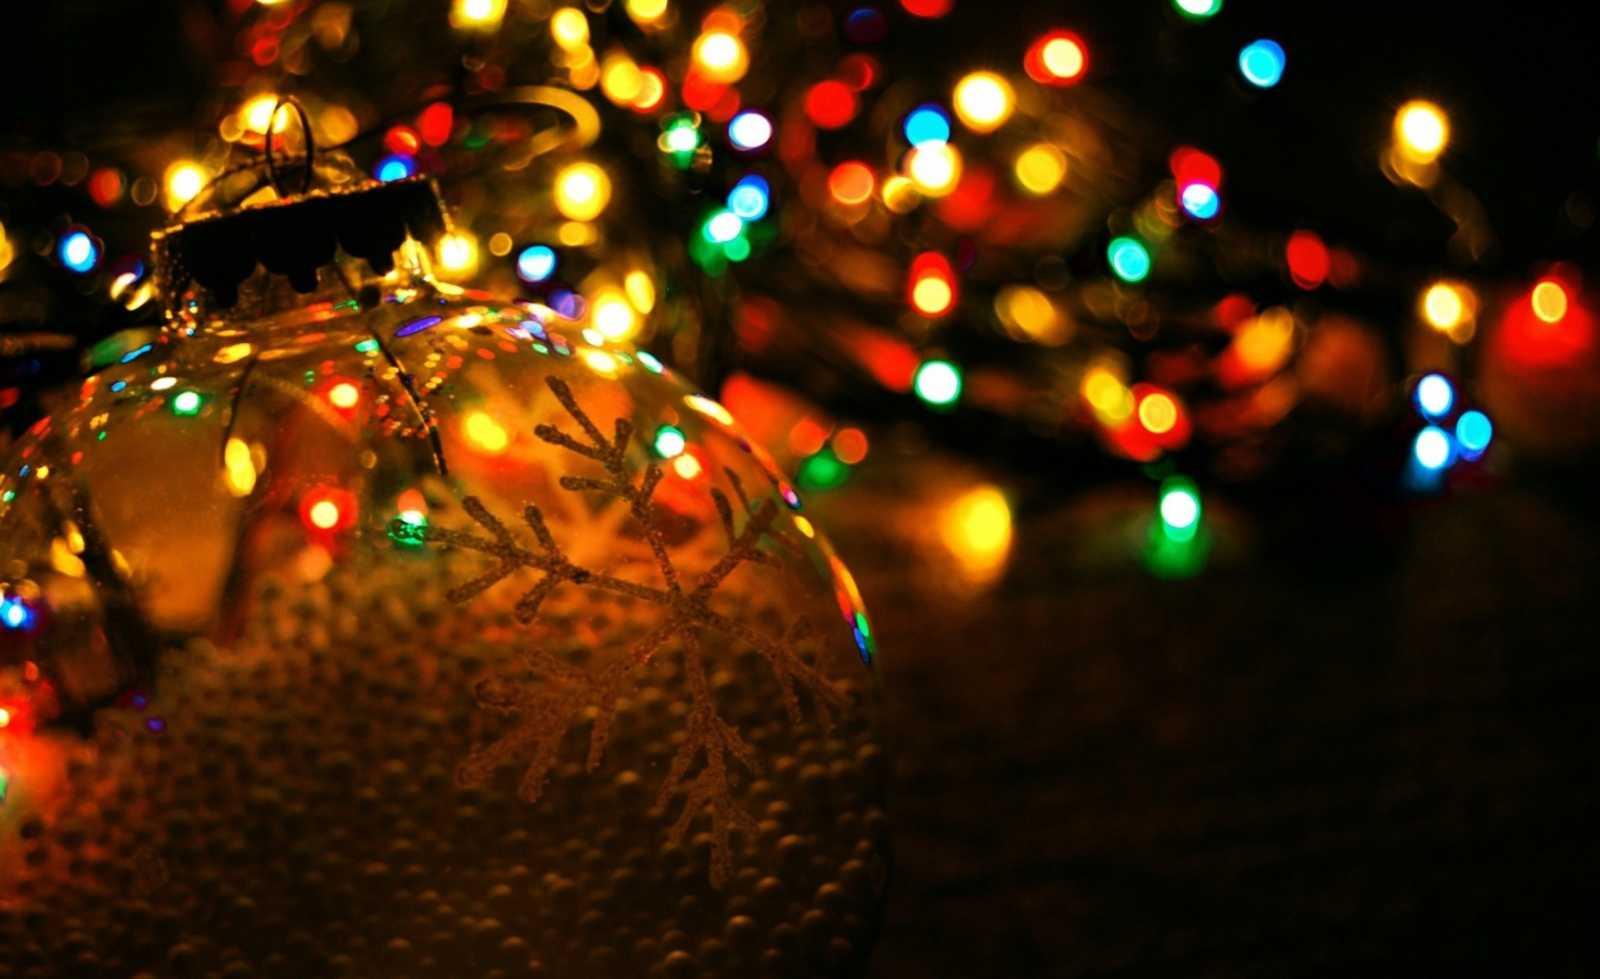 Sfondi Natalizi Jpg.Desktop Wallpaper Speciale Natale 2013